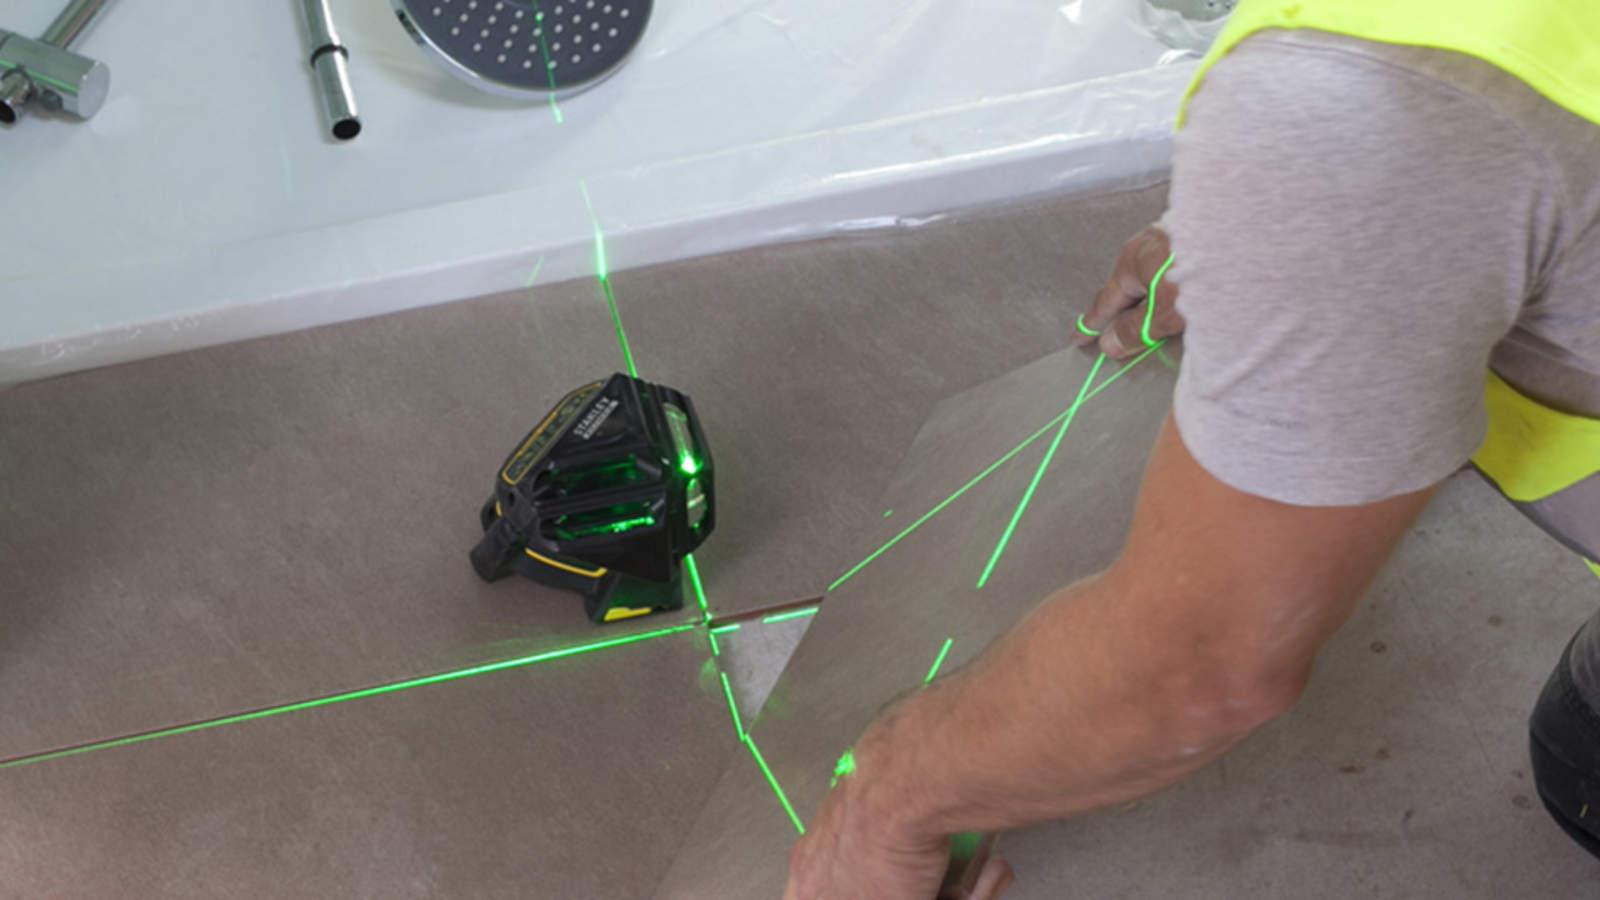 Test et avis du laser multiligne X3G-360° Vert FMHT1-77356 STANLEY FATMAX